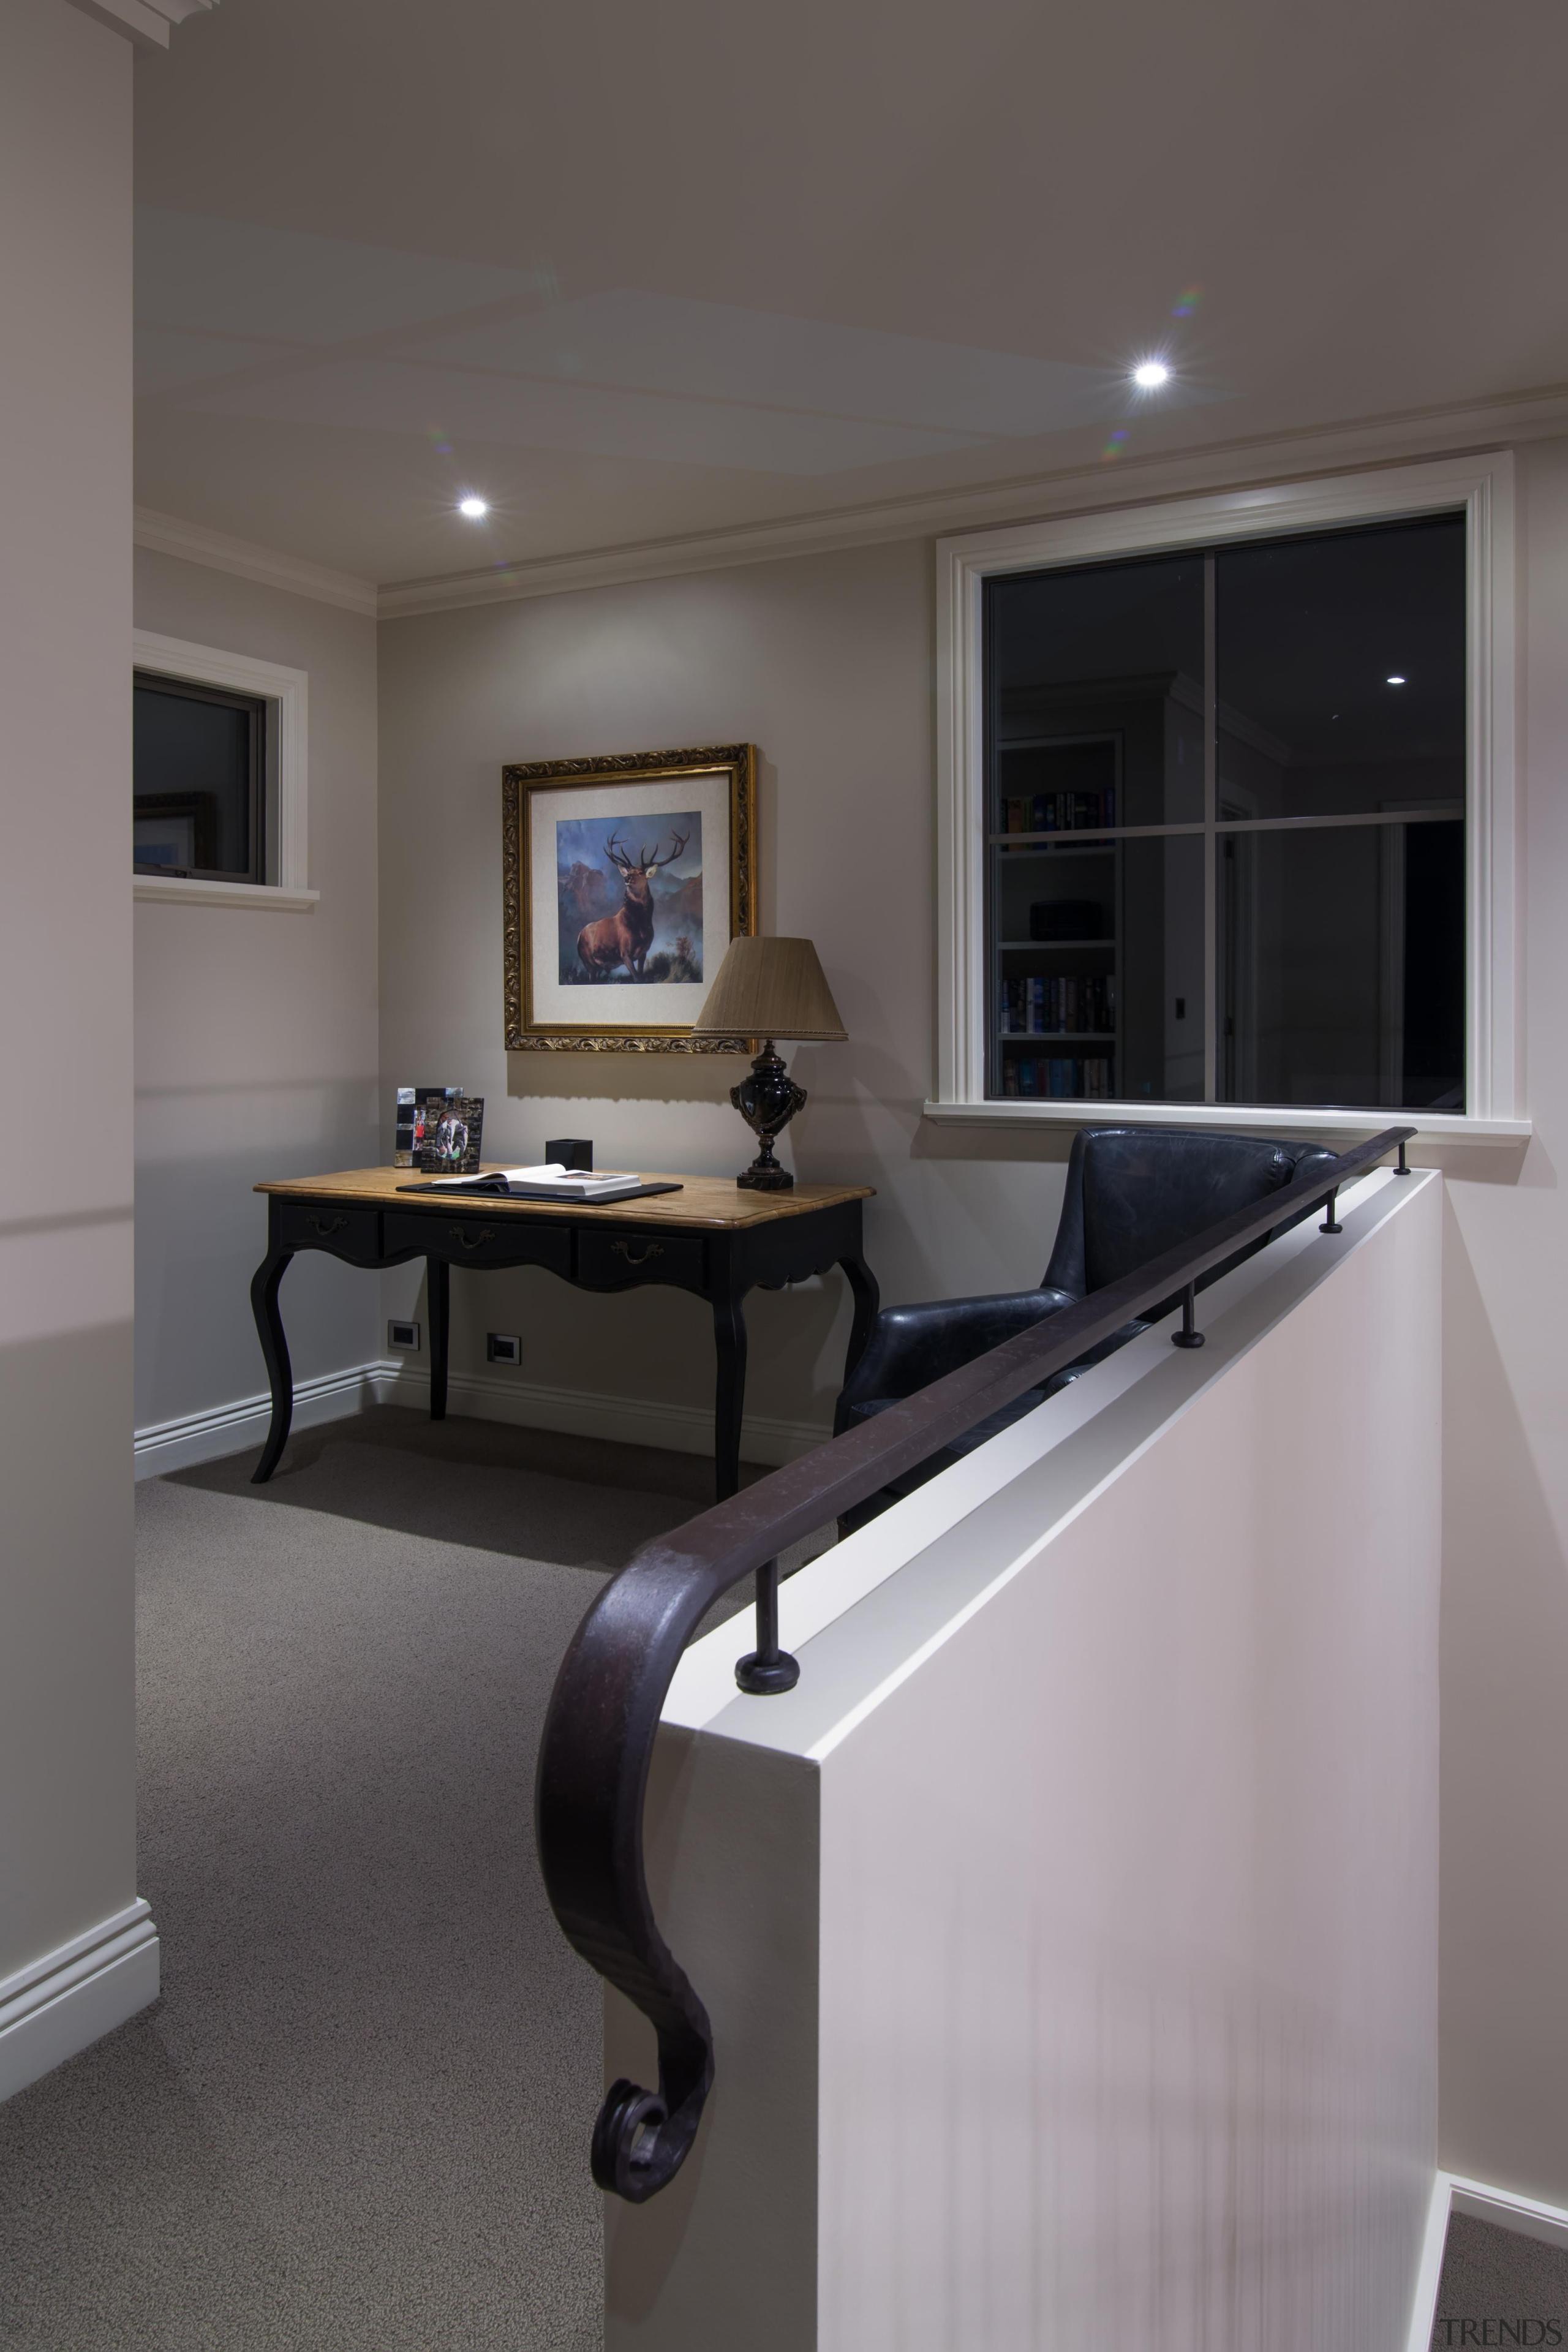 Img3517 - architecture | desk | floor | architecture, desk, floor, flooring, furniture, interior design, office, real estate, gray, black